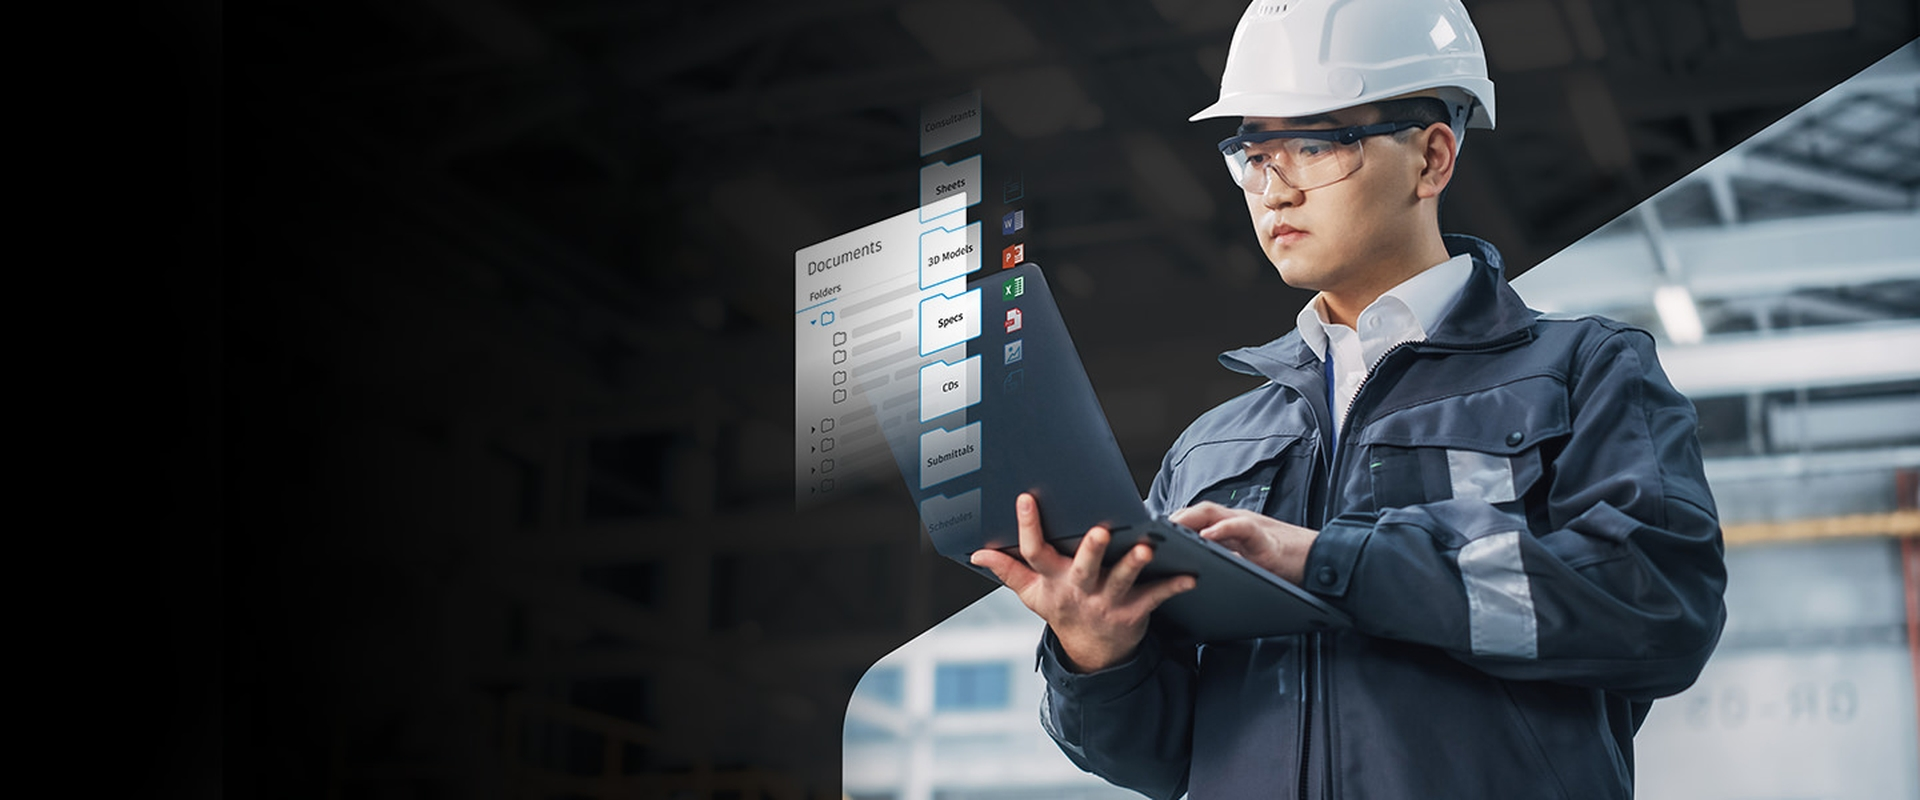 harnessingthedataadvantageinconstruction1440x600